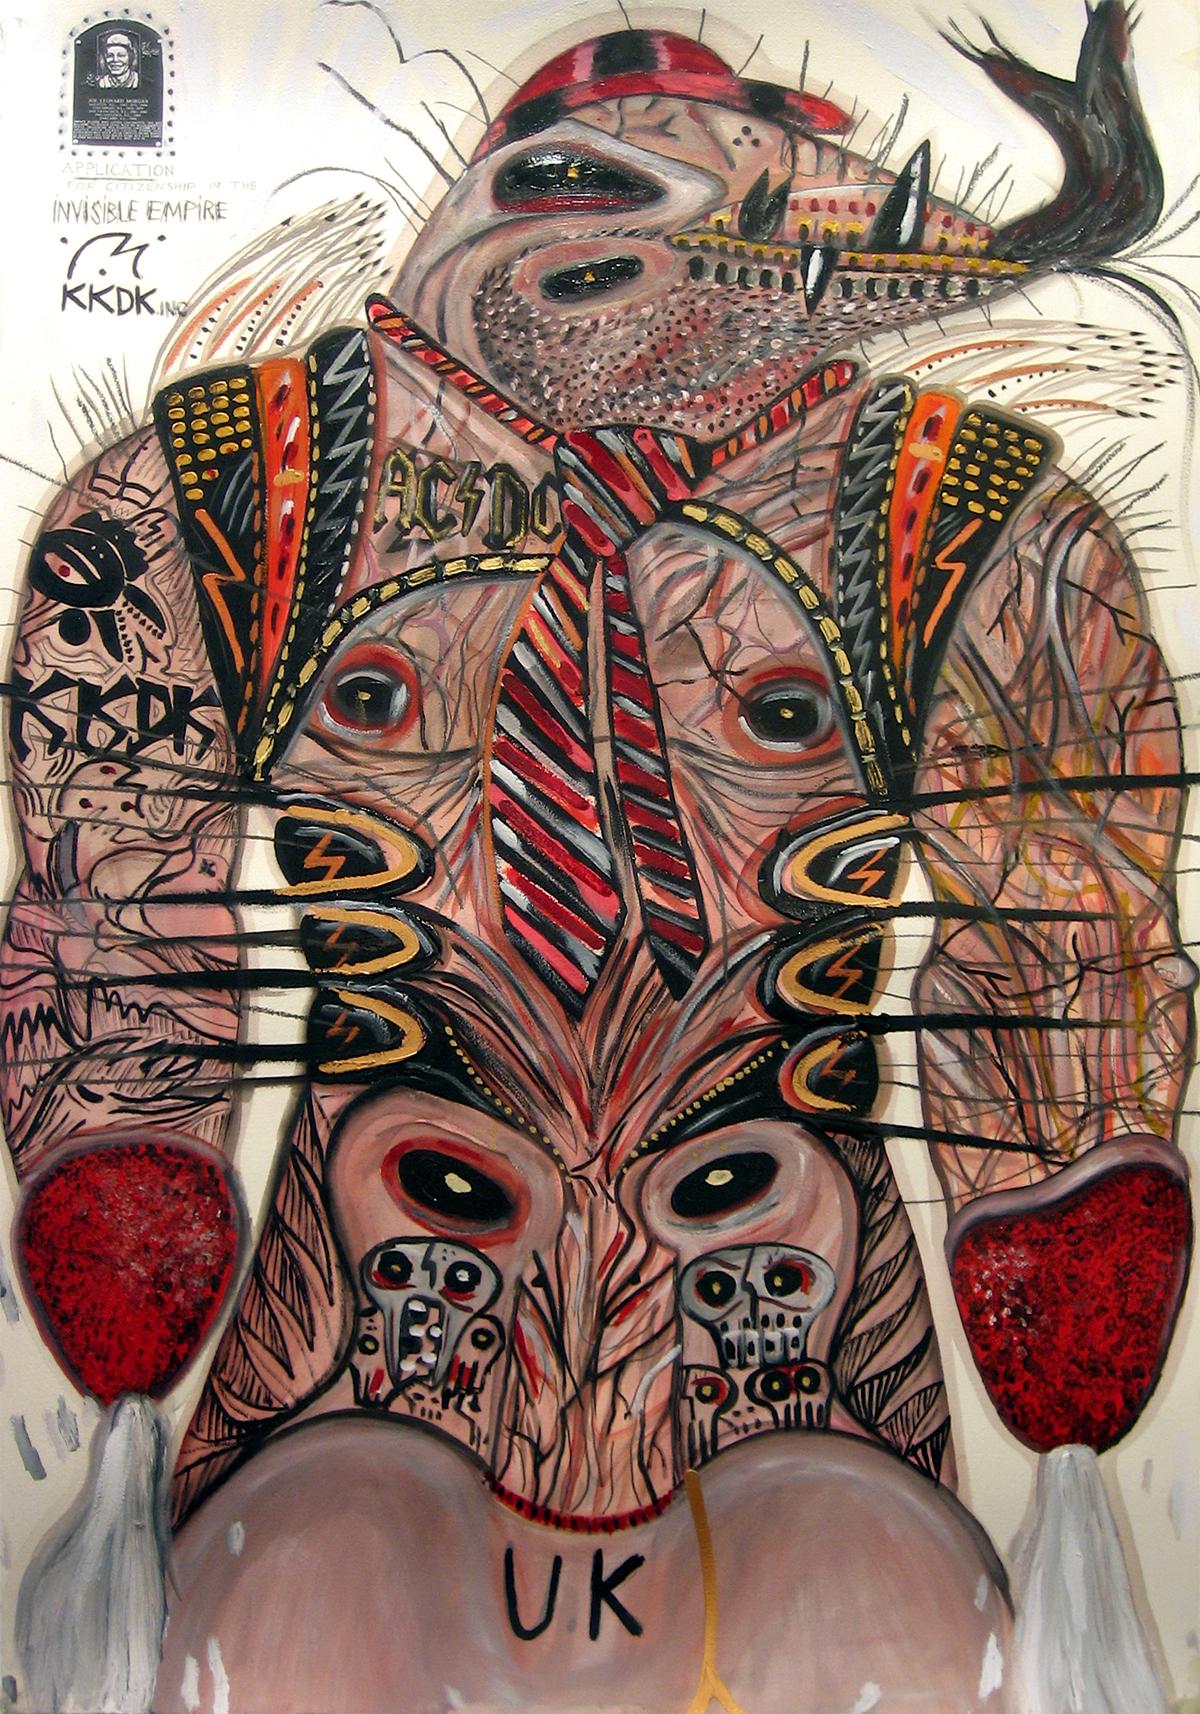 Abdul Vas. The Texas Chainsaw Massacre + Cincinnati Reds. The Invisible Empire, 2005